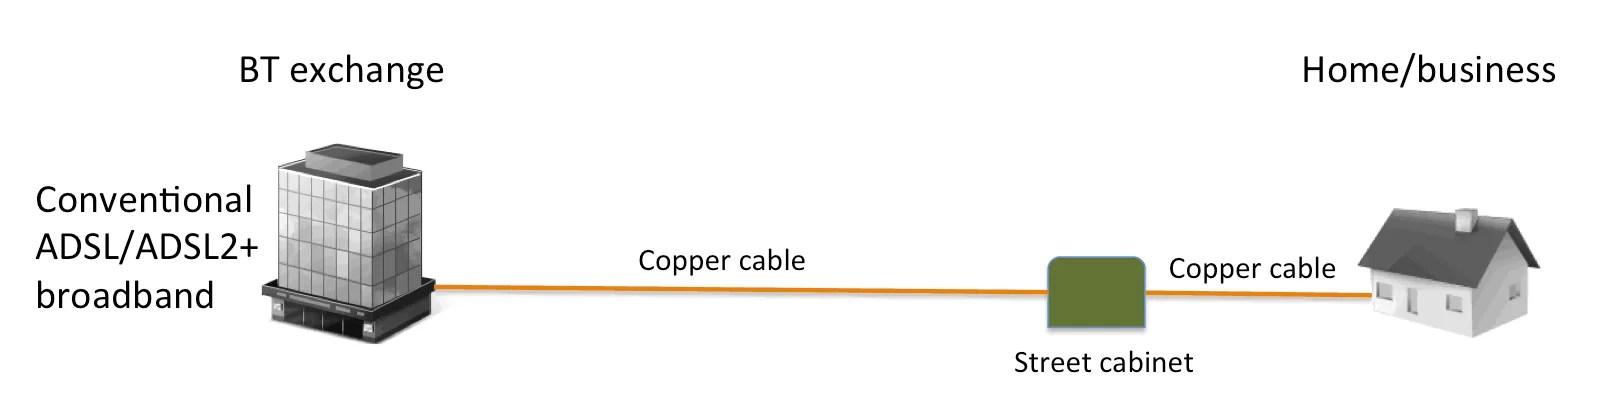 bt vdsl wiring diagram fender american standard strat what is fibre broadband increase speed conventional adsl adsl2